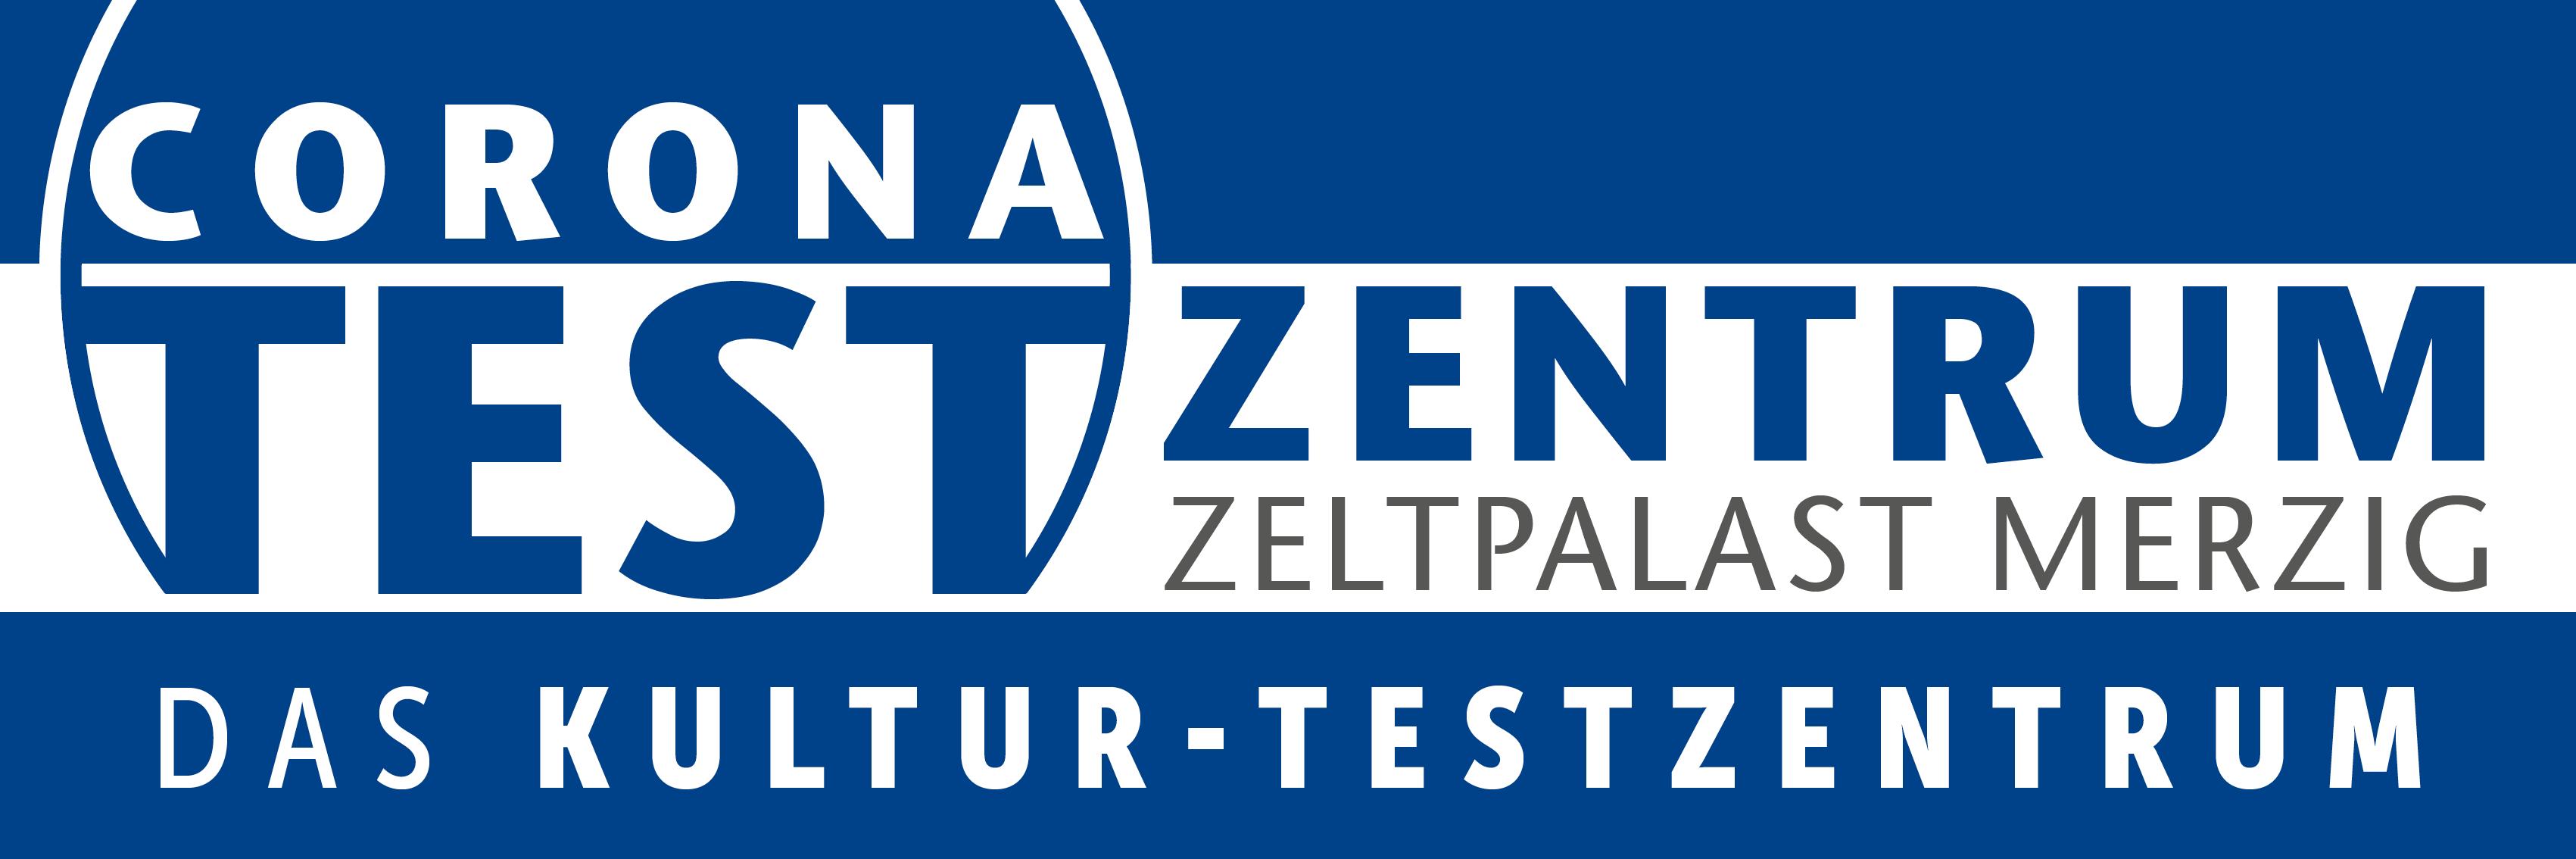 Testzentrum Zeltpalast